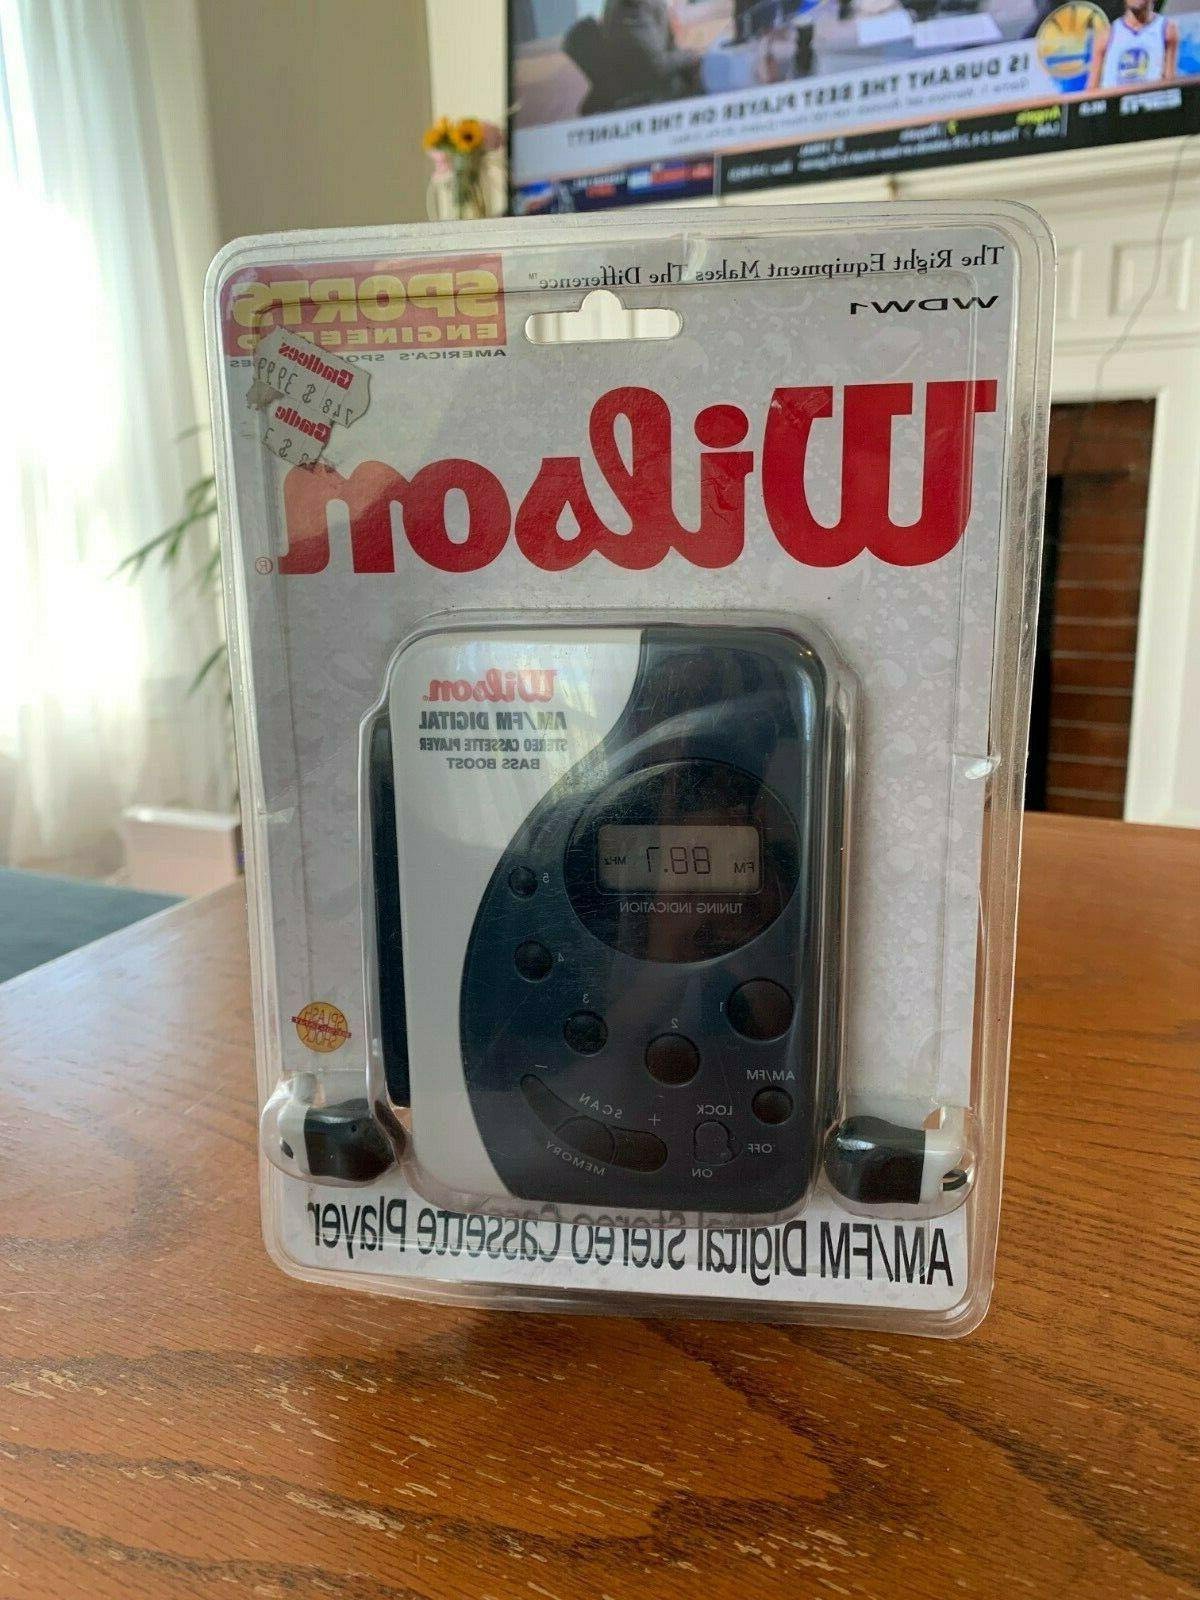 wdw1 am fm digital stereo cassette player